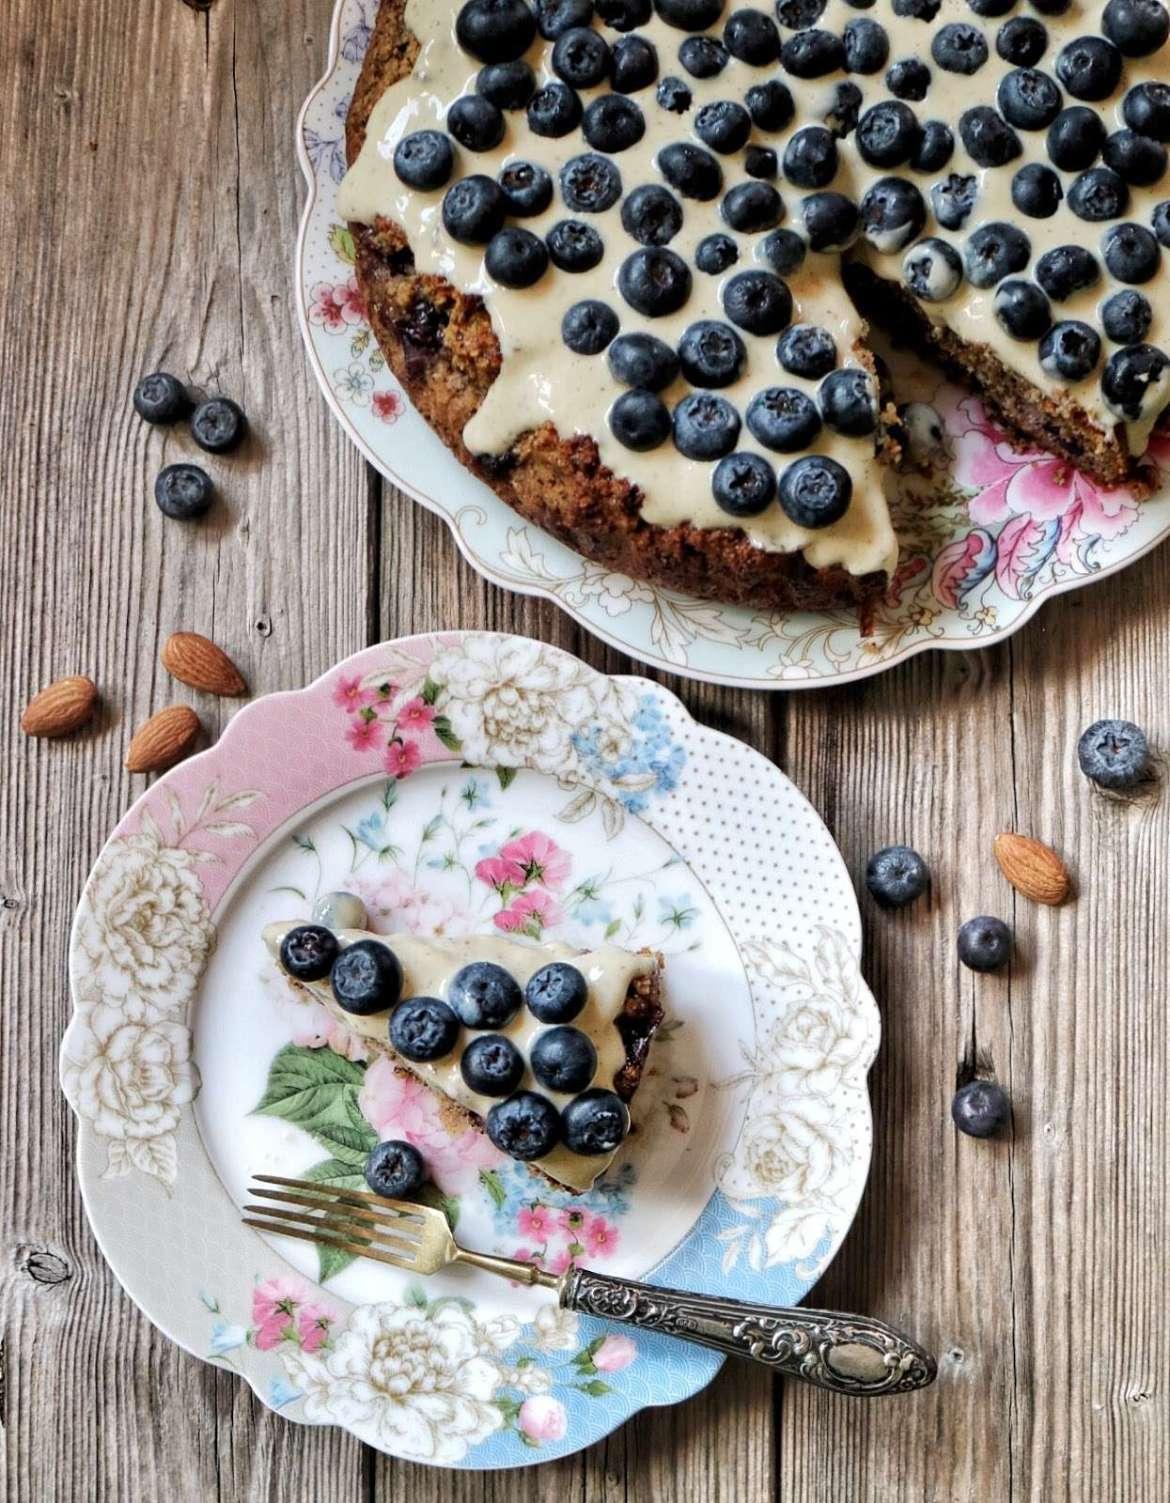 torta di mandorle e mirtilli